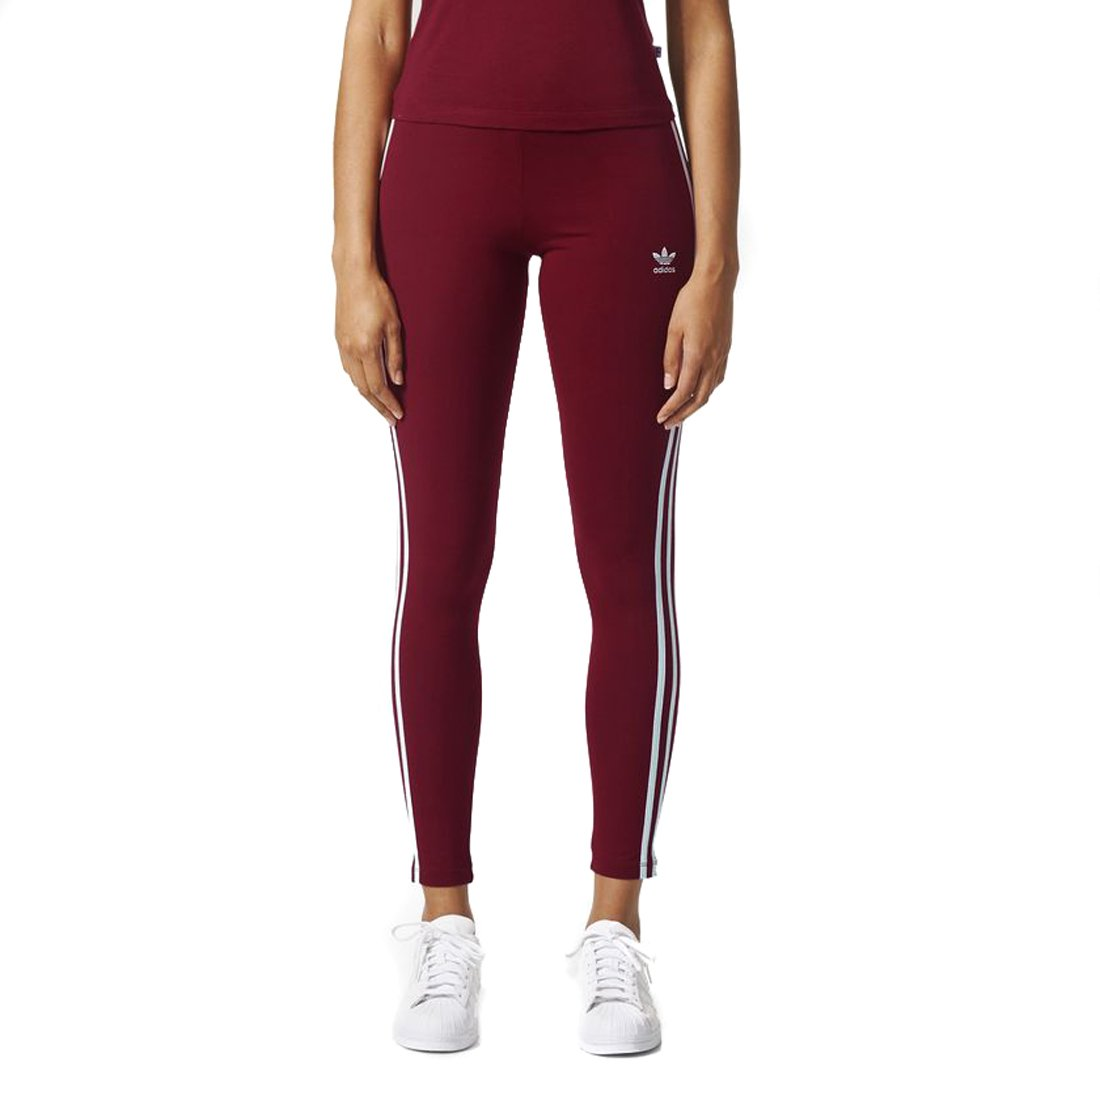 adidas Originals Women's 3-Stripes Leggings, Collegiate Burgundy, Small by adidas Originals